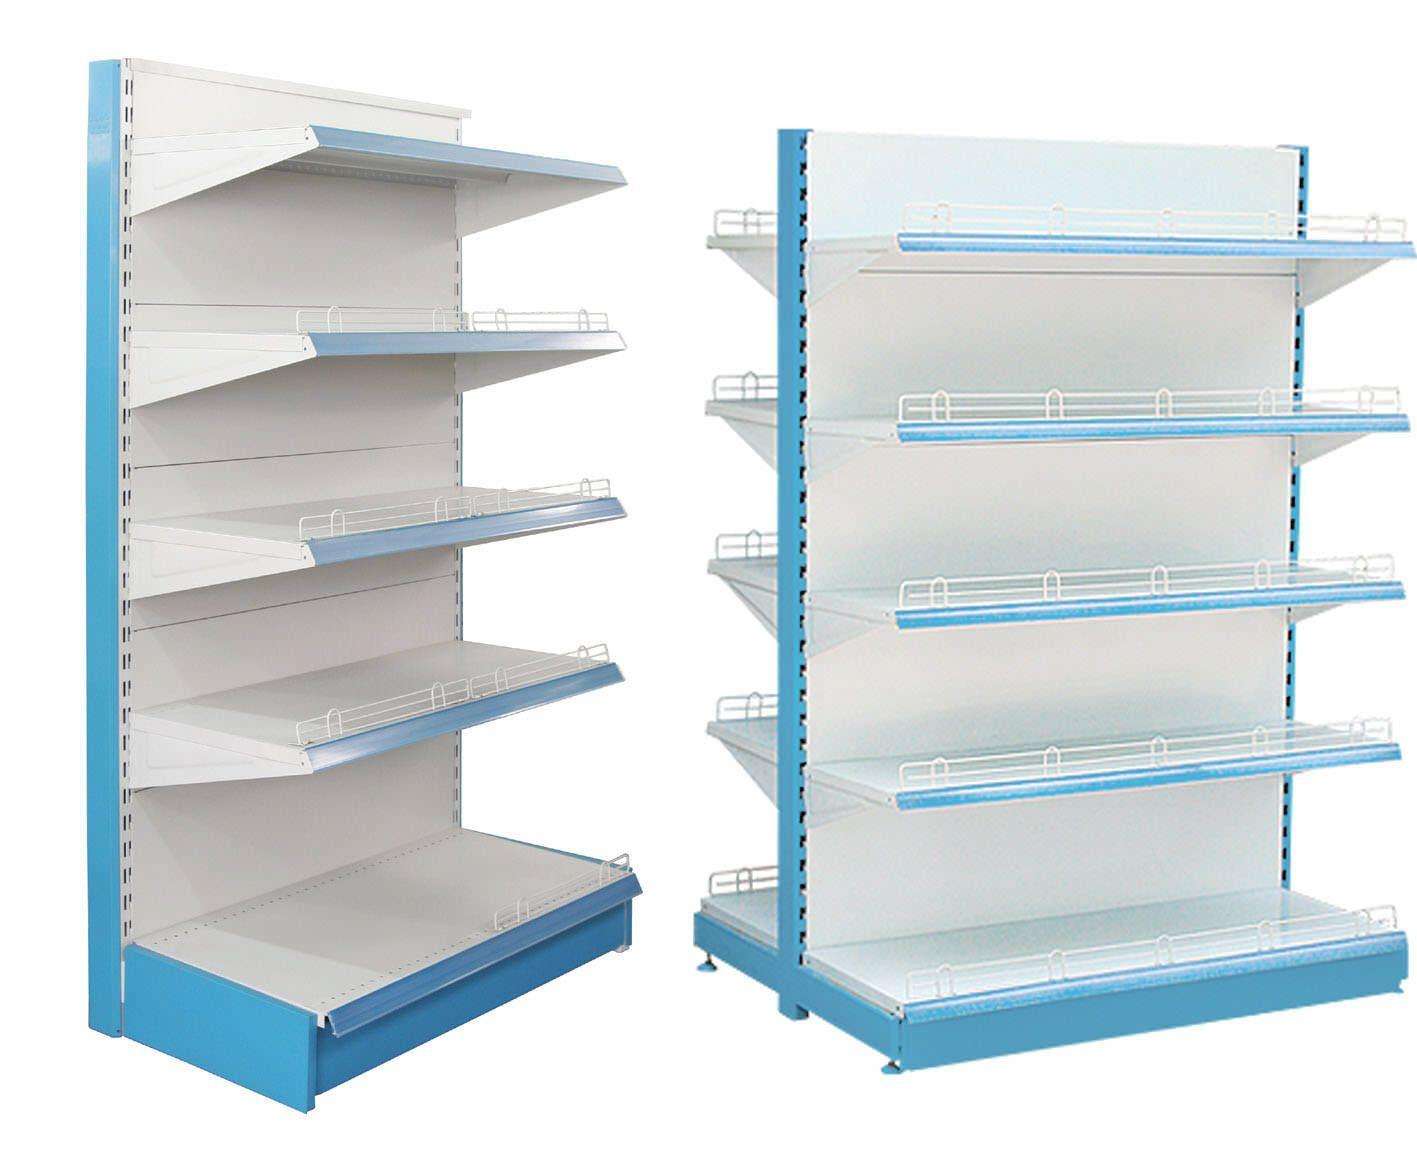 29 Racks ideas | racks, shelving racks, steel racks